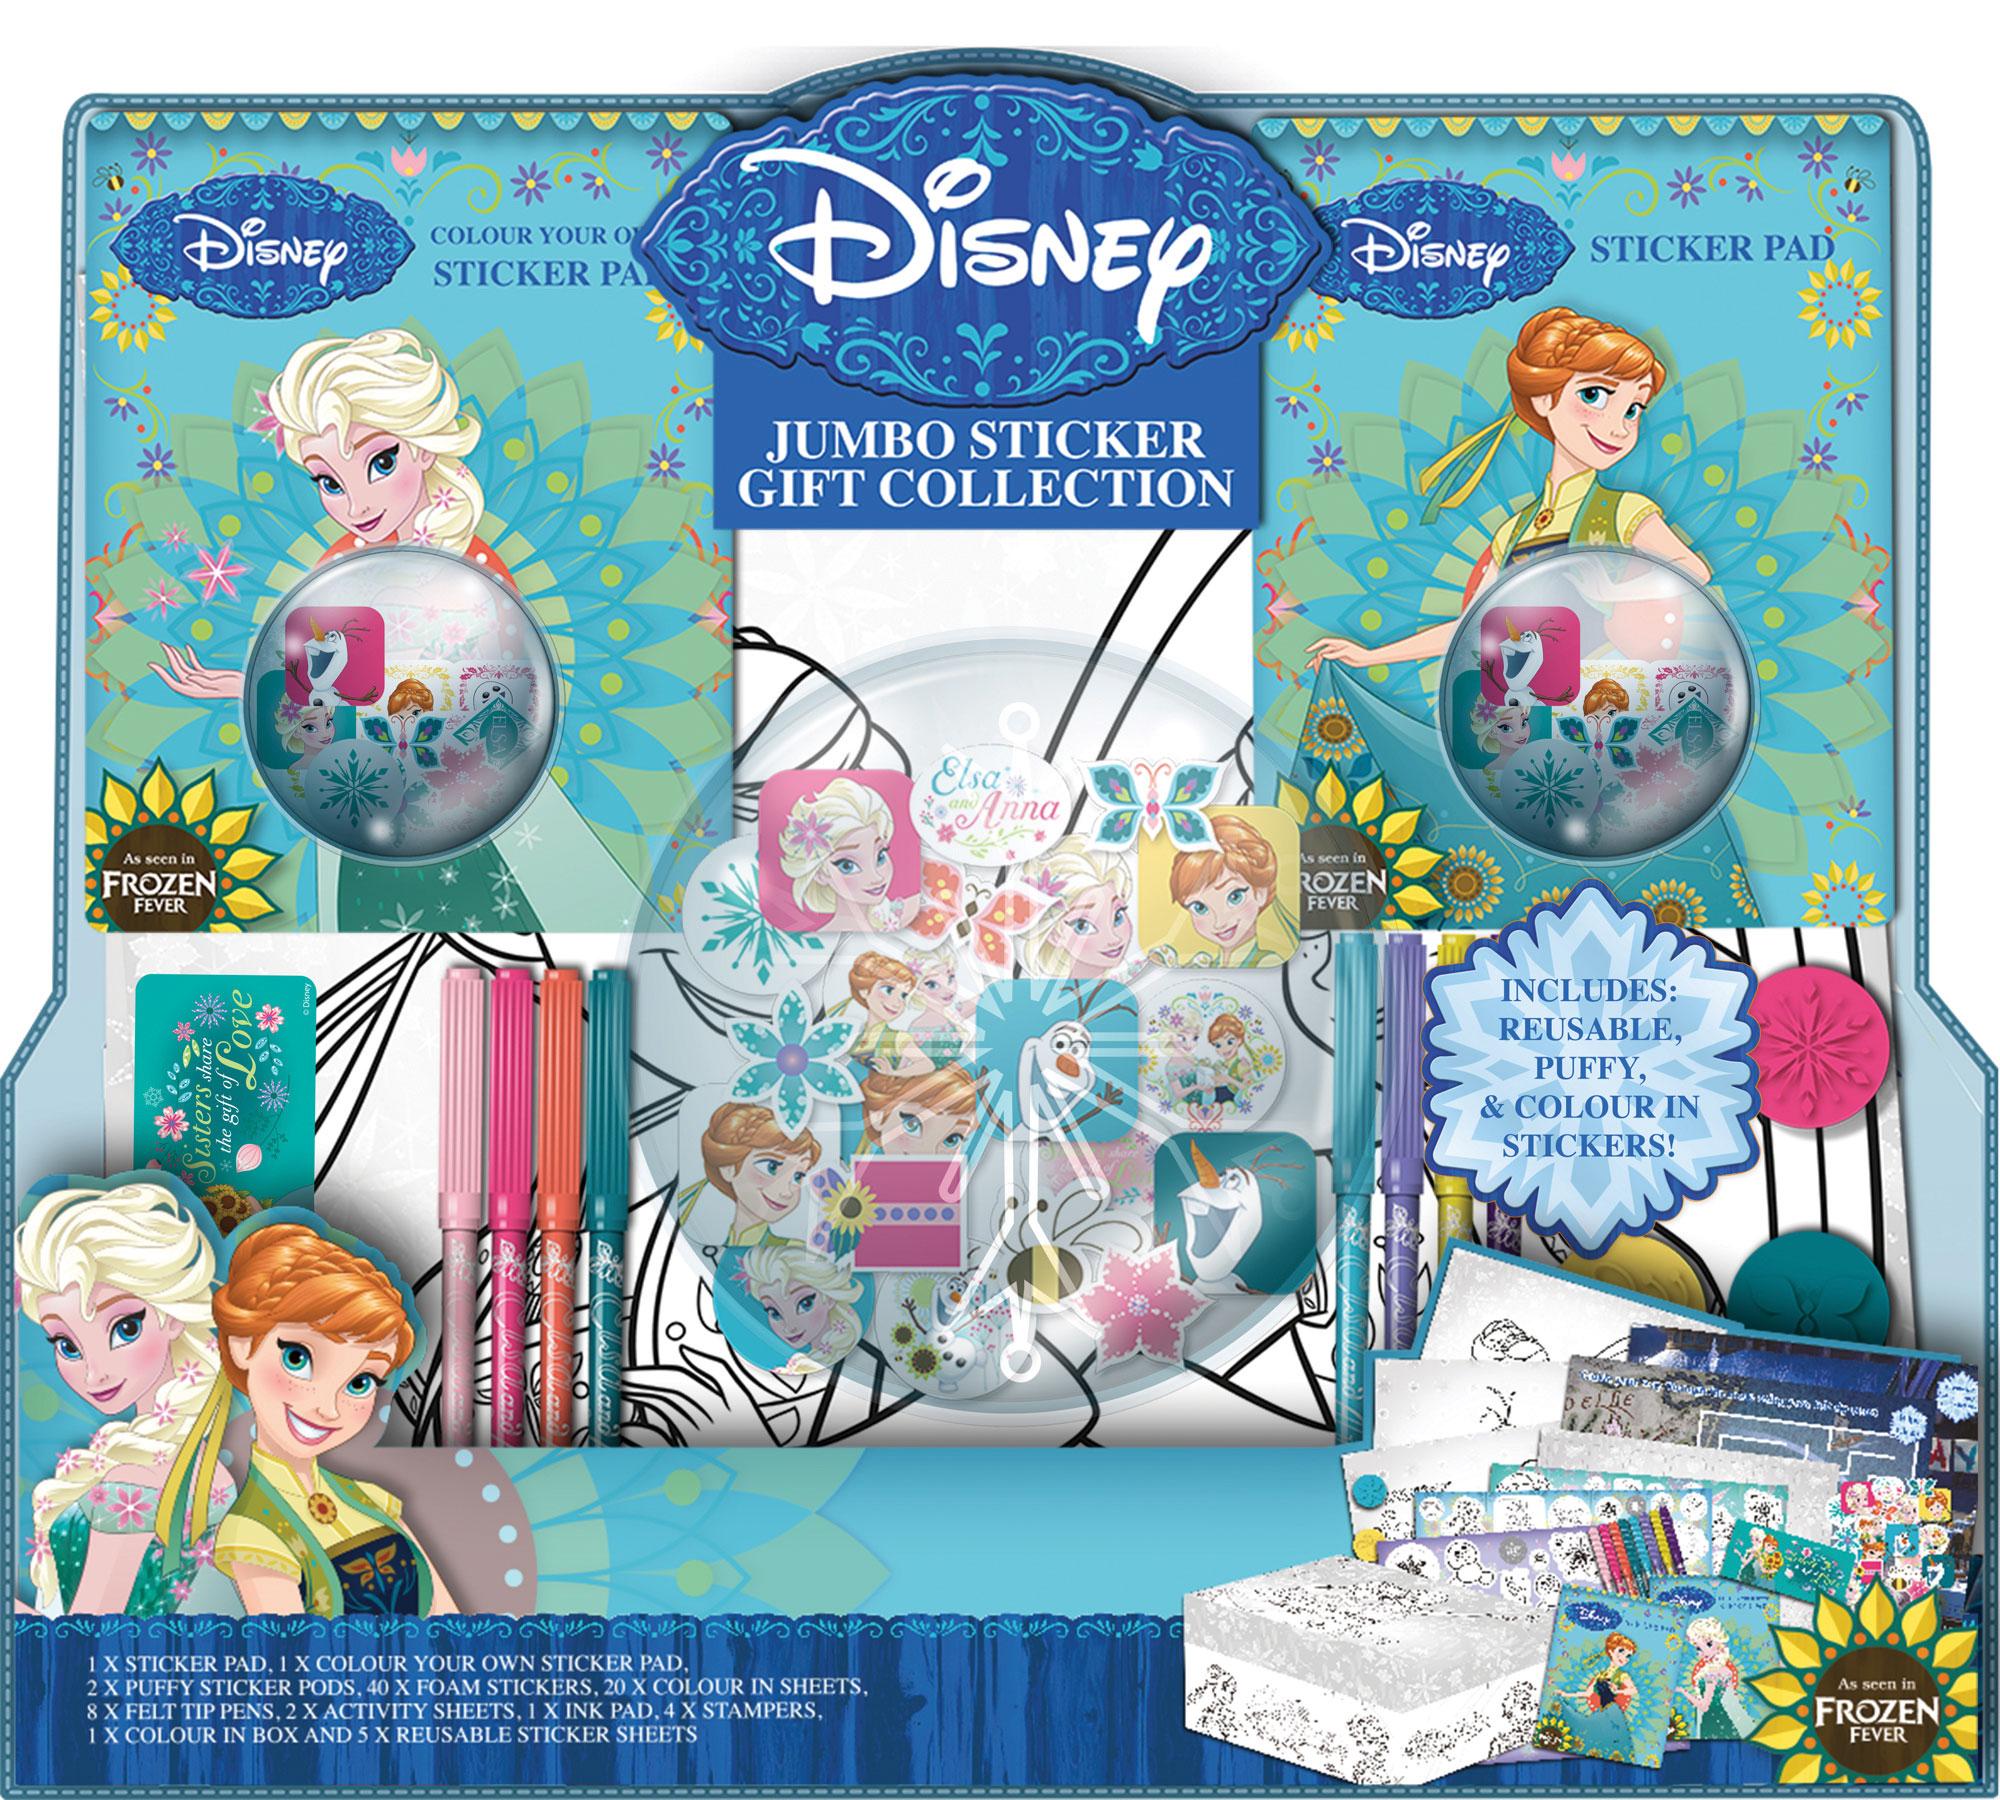 Disney Frozen Jumbo Sticker Gift Collection